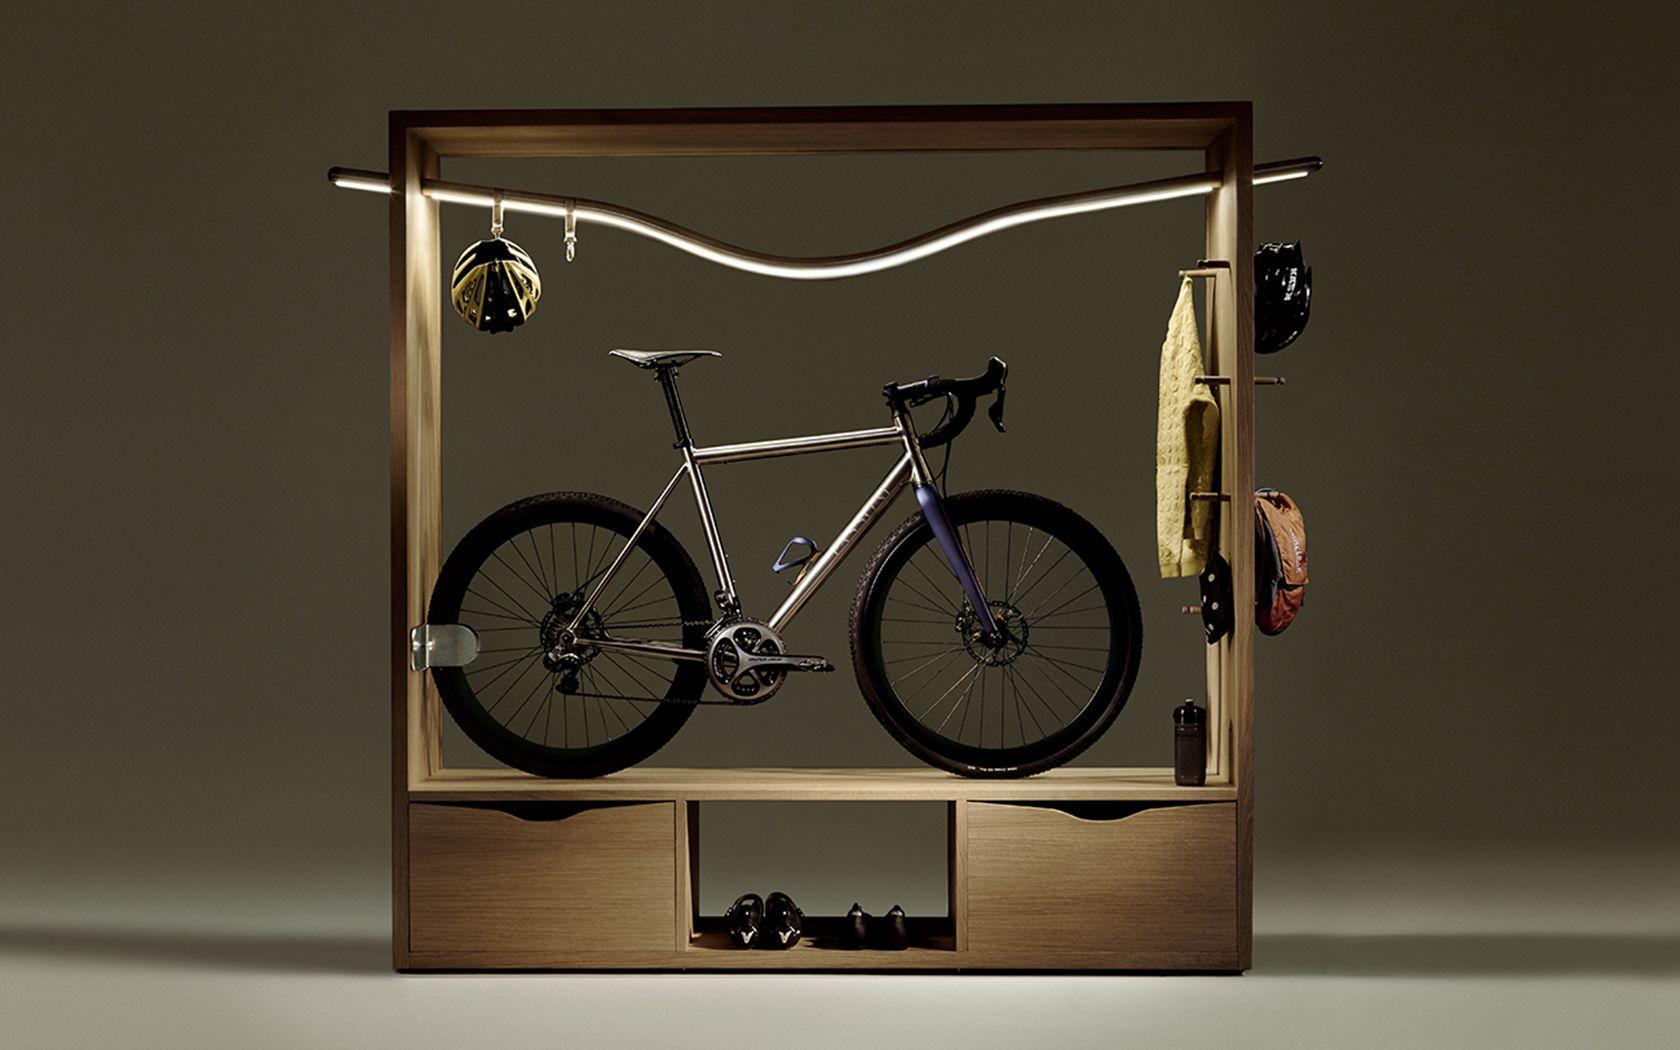 Ledライトバー搭載自転車ディスプレイシェルフ 自転車の収納庫